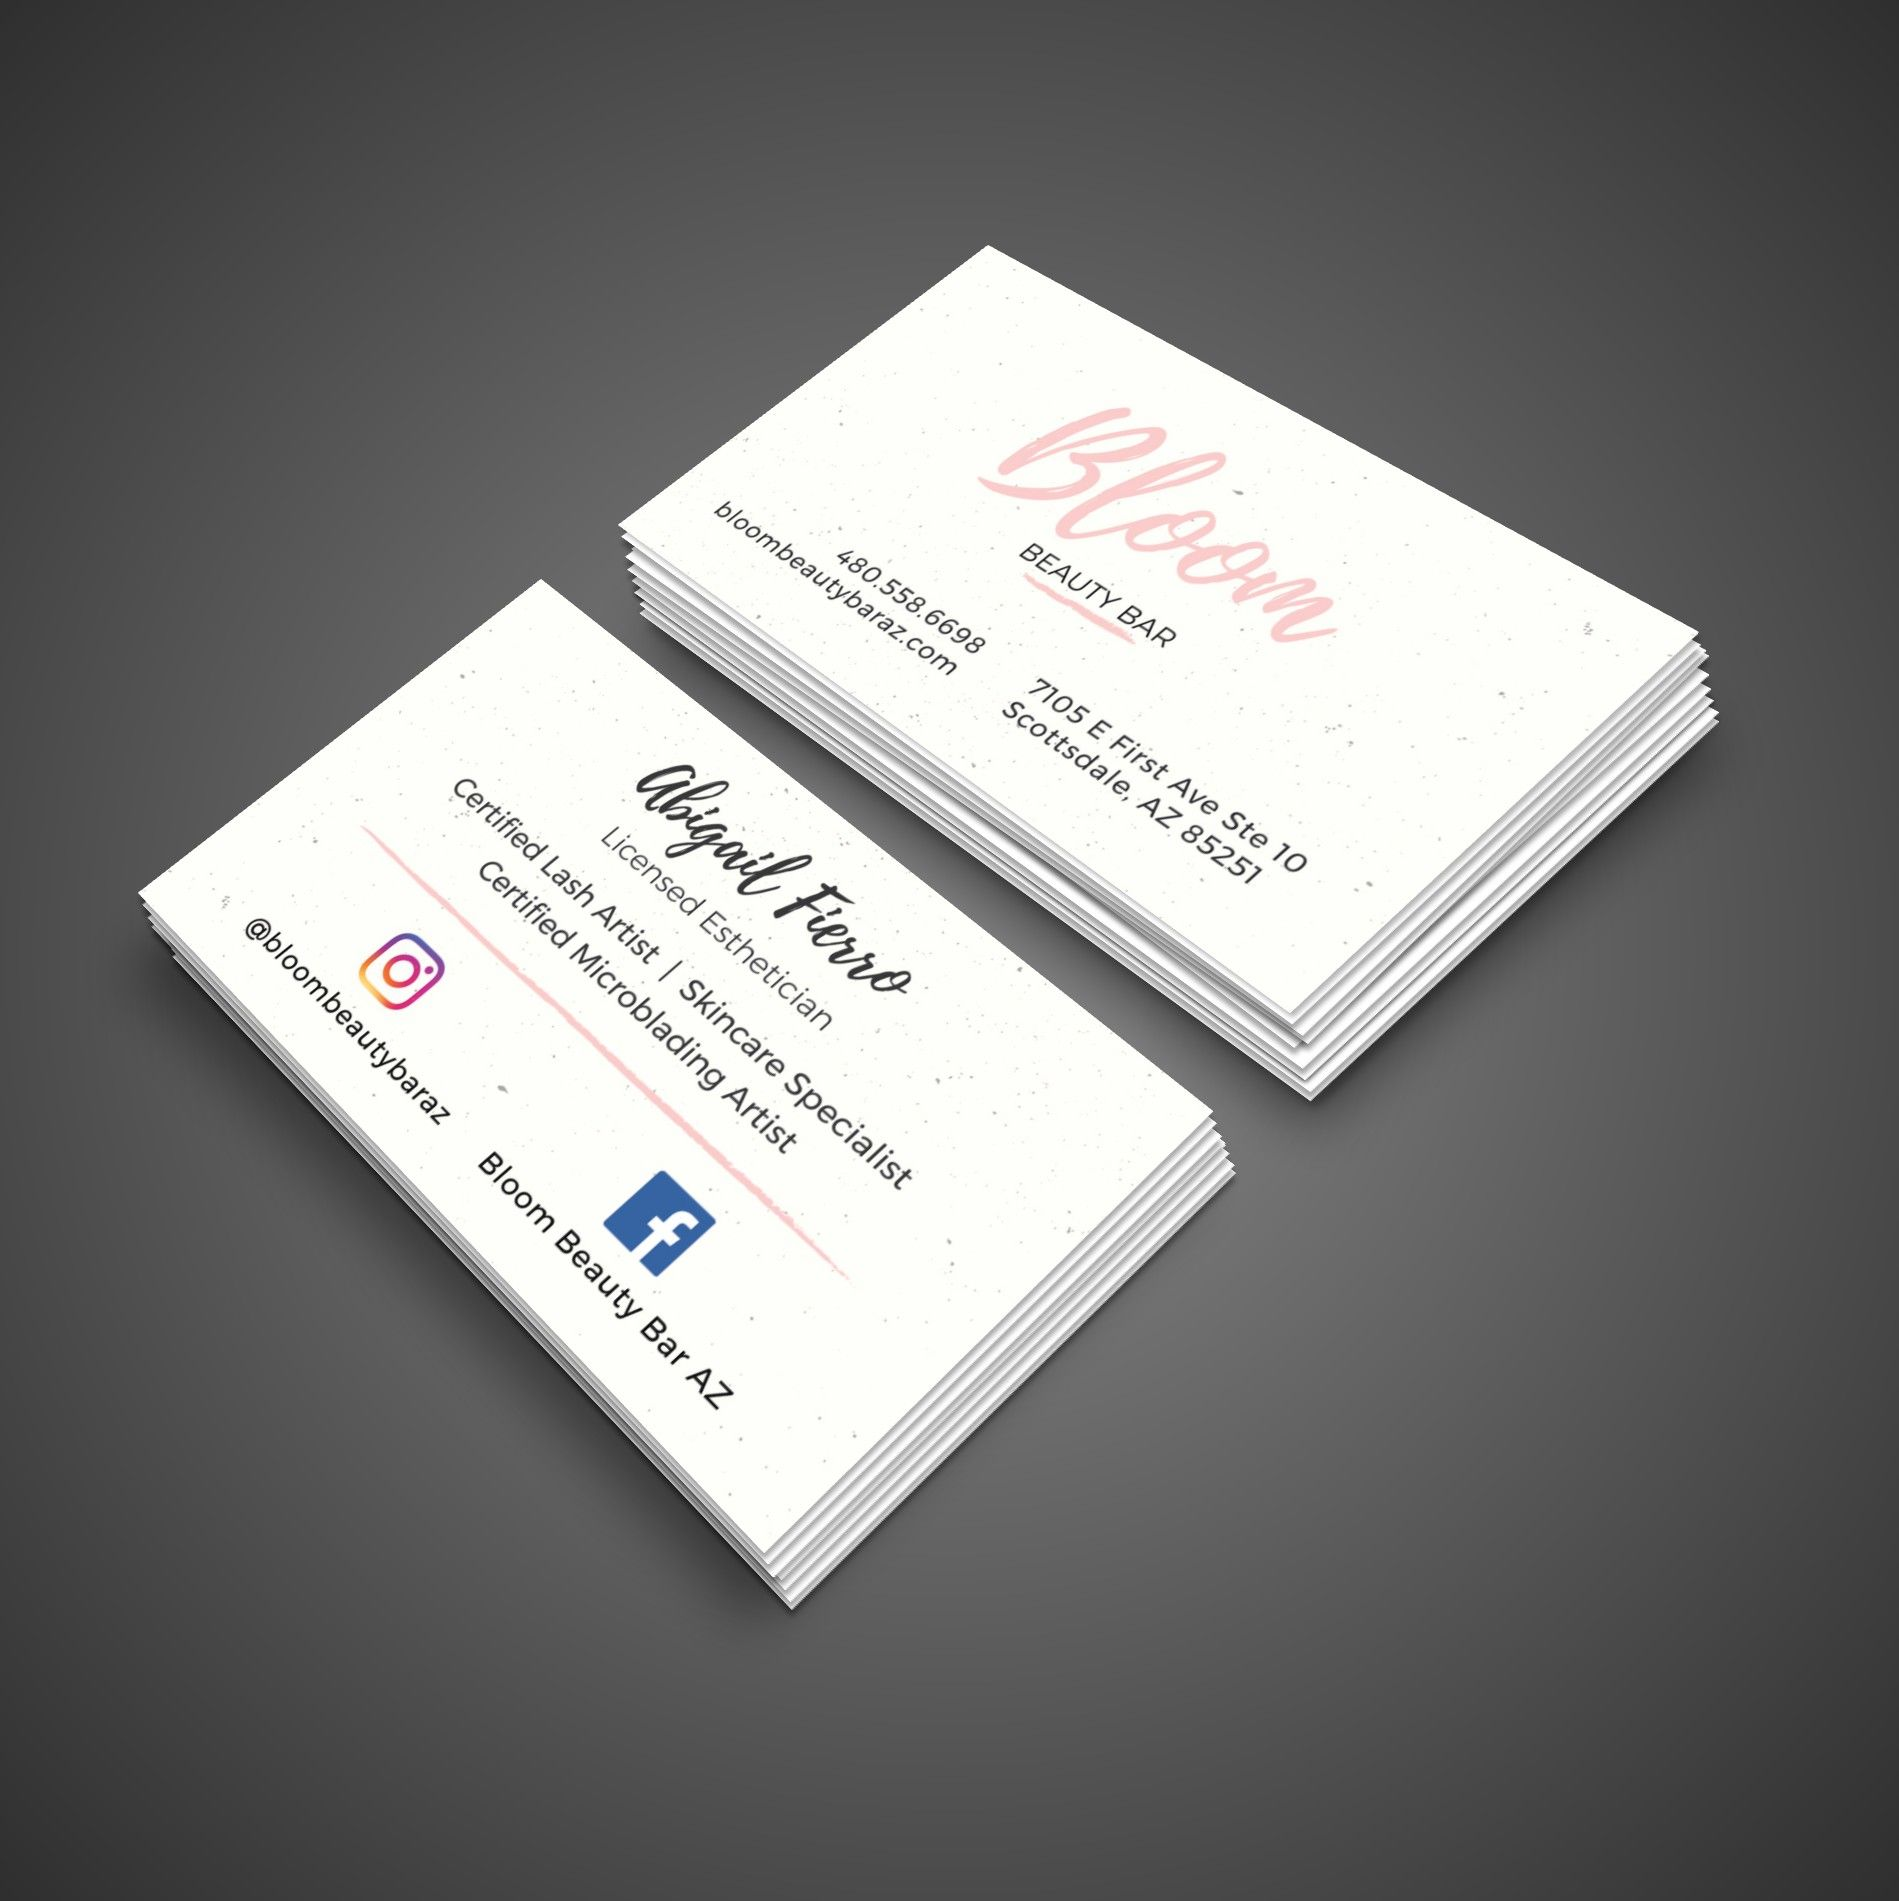 Half pint web design business card design for licensed esthetician half pint web design business card design for licensed esthetician located in scottsdale az colourmoves